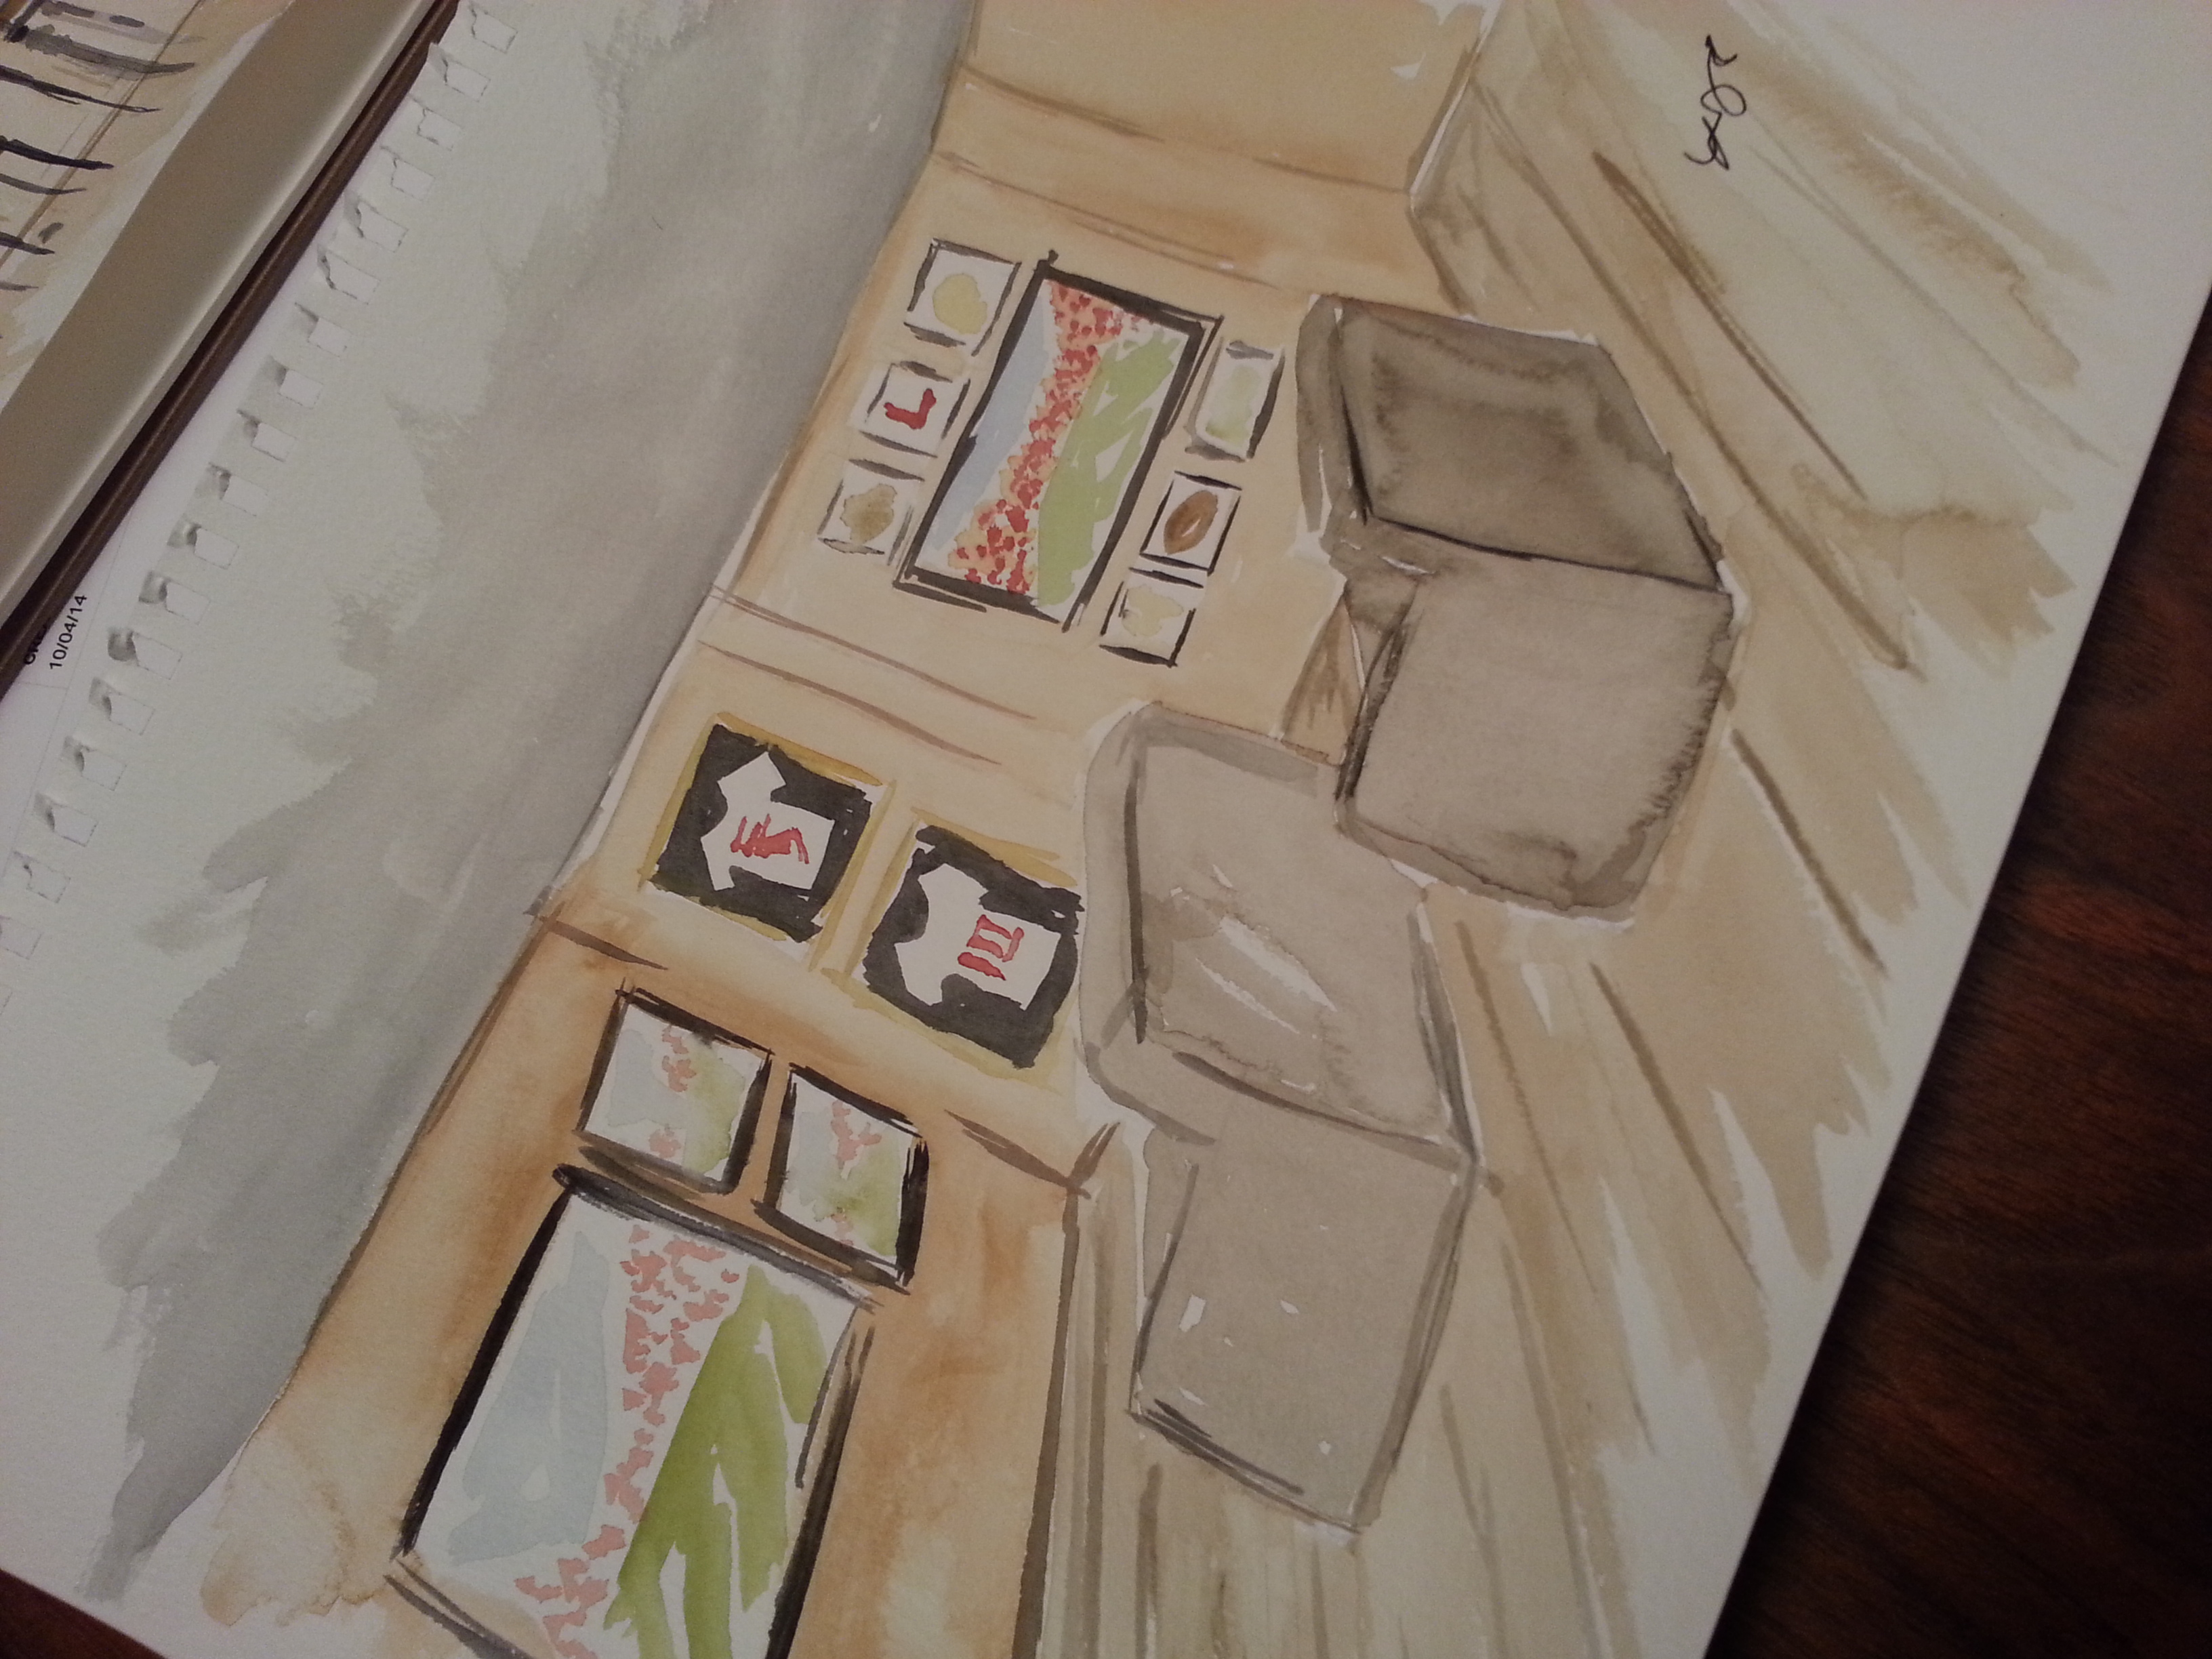 Theatre Area, Mantuary sketch byprincipal designer, Lisa